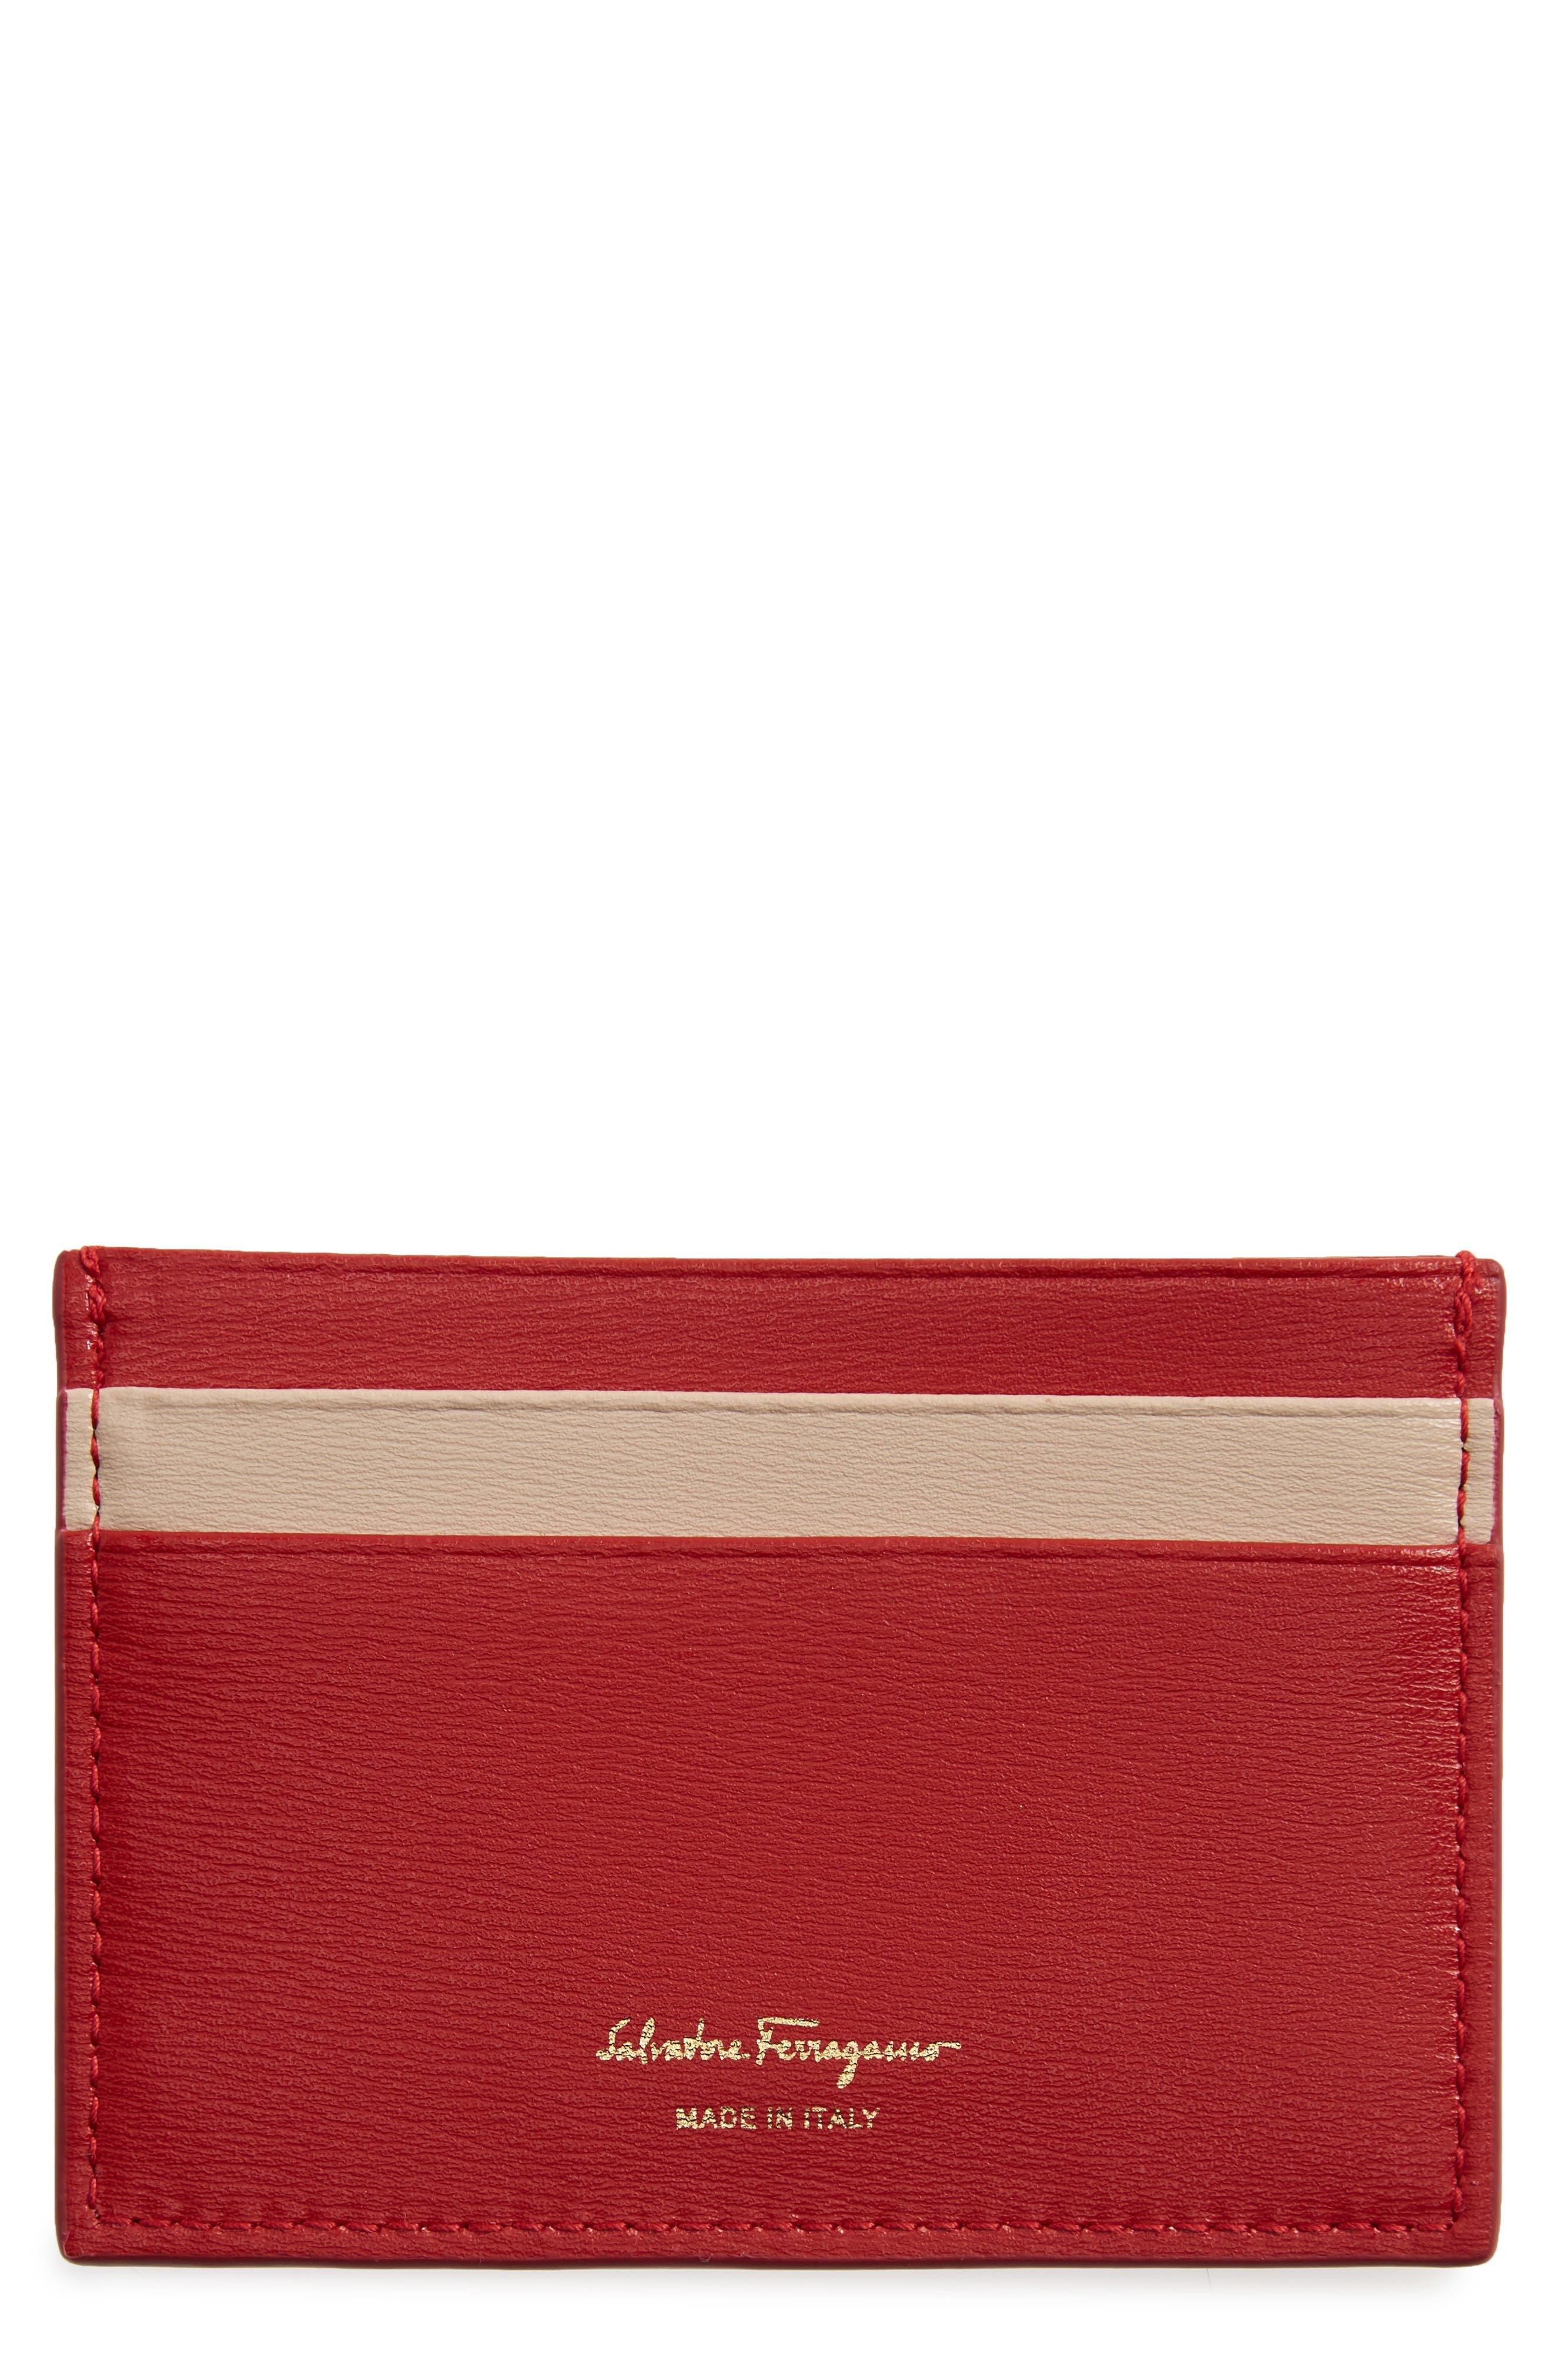 SALVATORE FERRAGAMO,                             City Quilted Gancio Leather Card Case,                             Main thumbnail 1, color,                             LIPSTICK